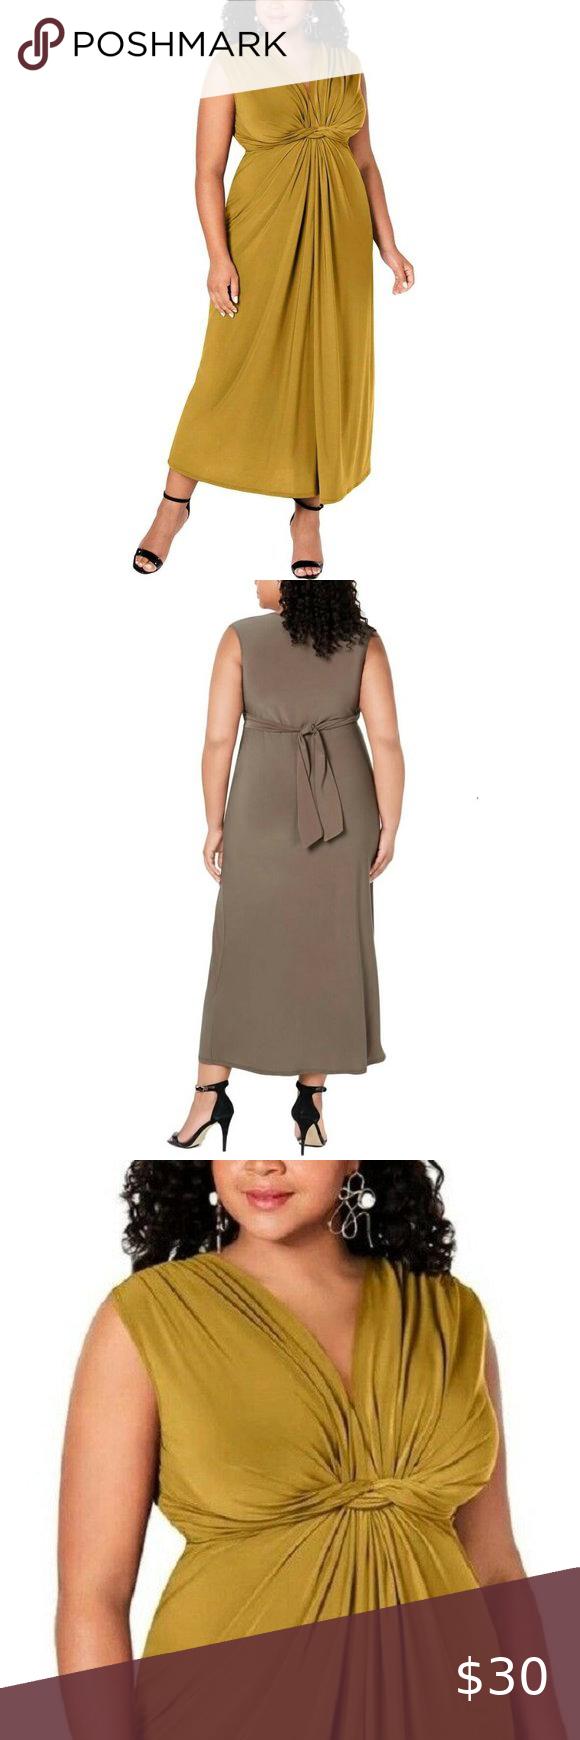 Love Squared 3x Marigold Maxi Dress Nwt Cw47 Maxi Dress Dresses Womens Dresses [ 1740 x 580 Pixel ]